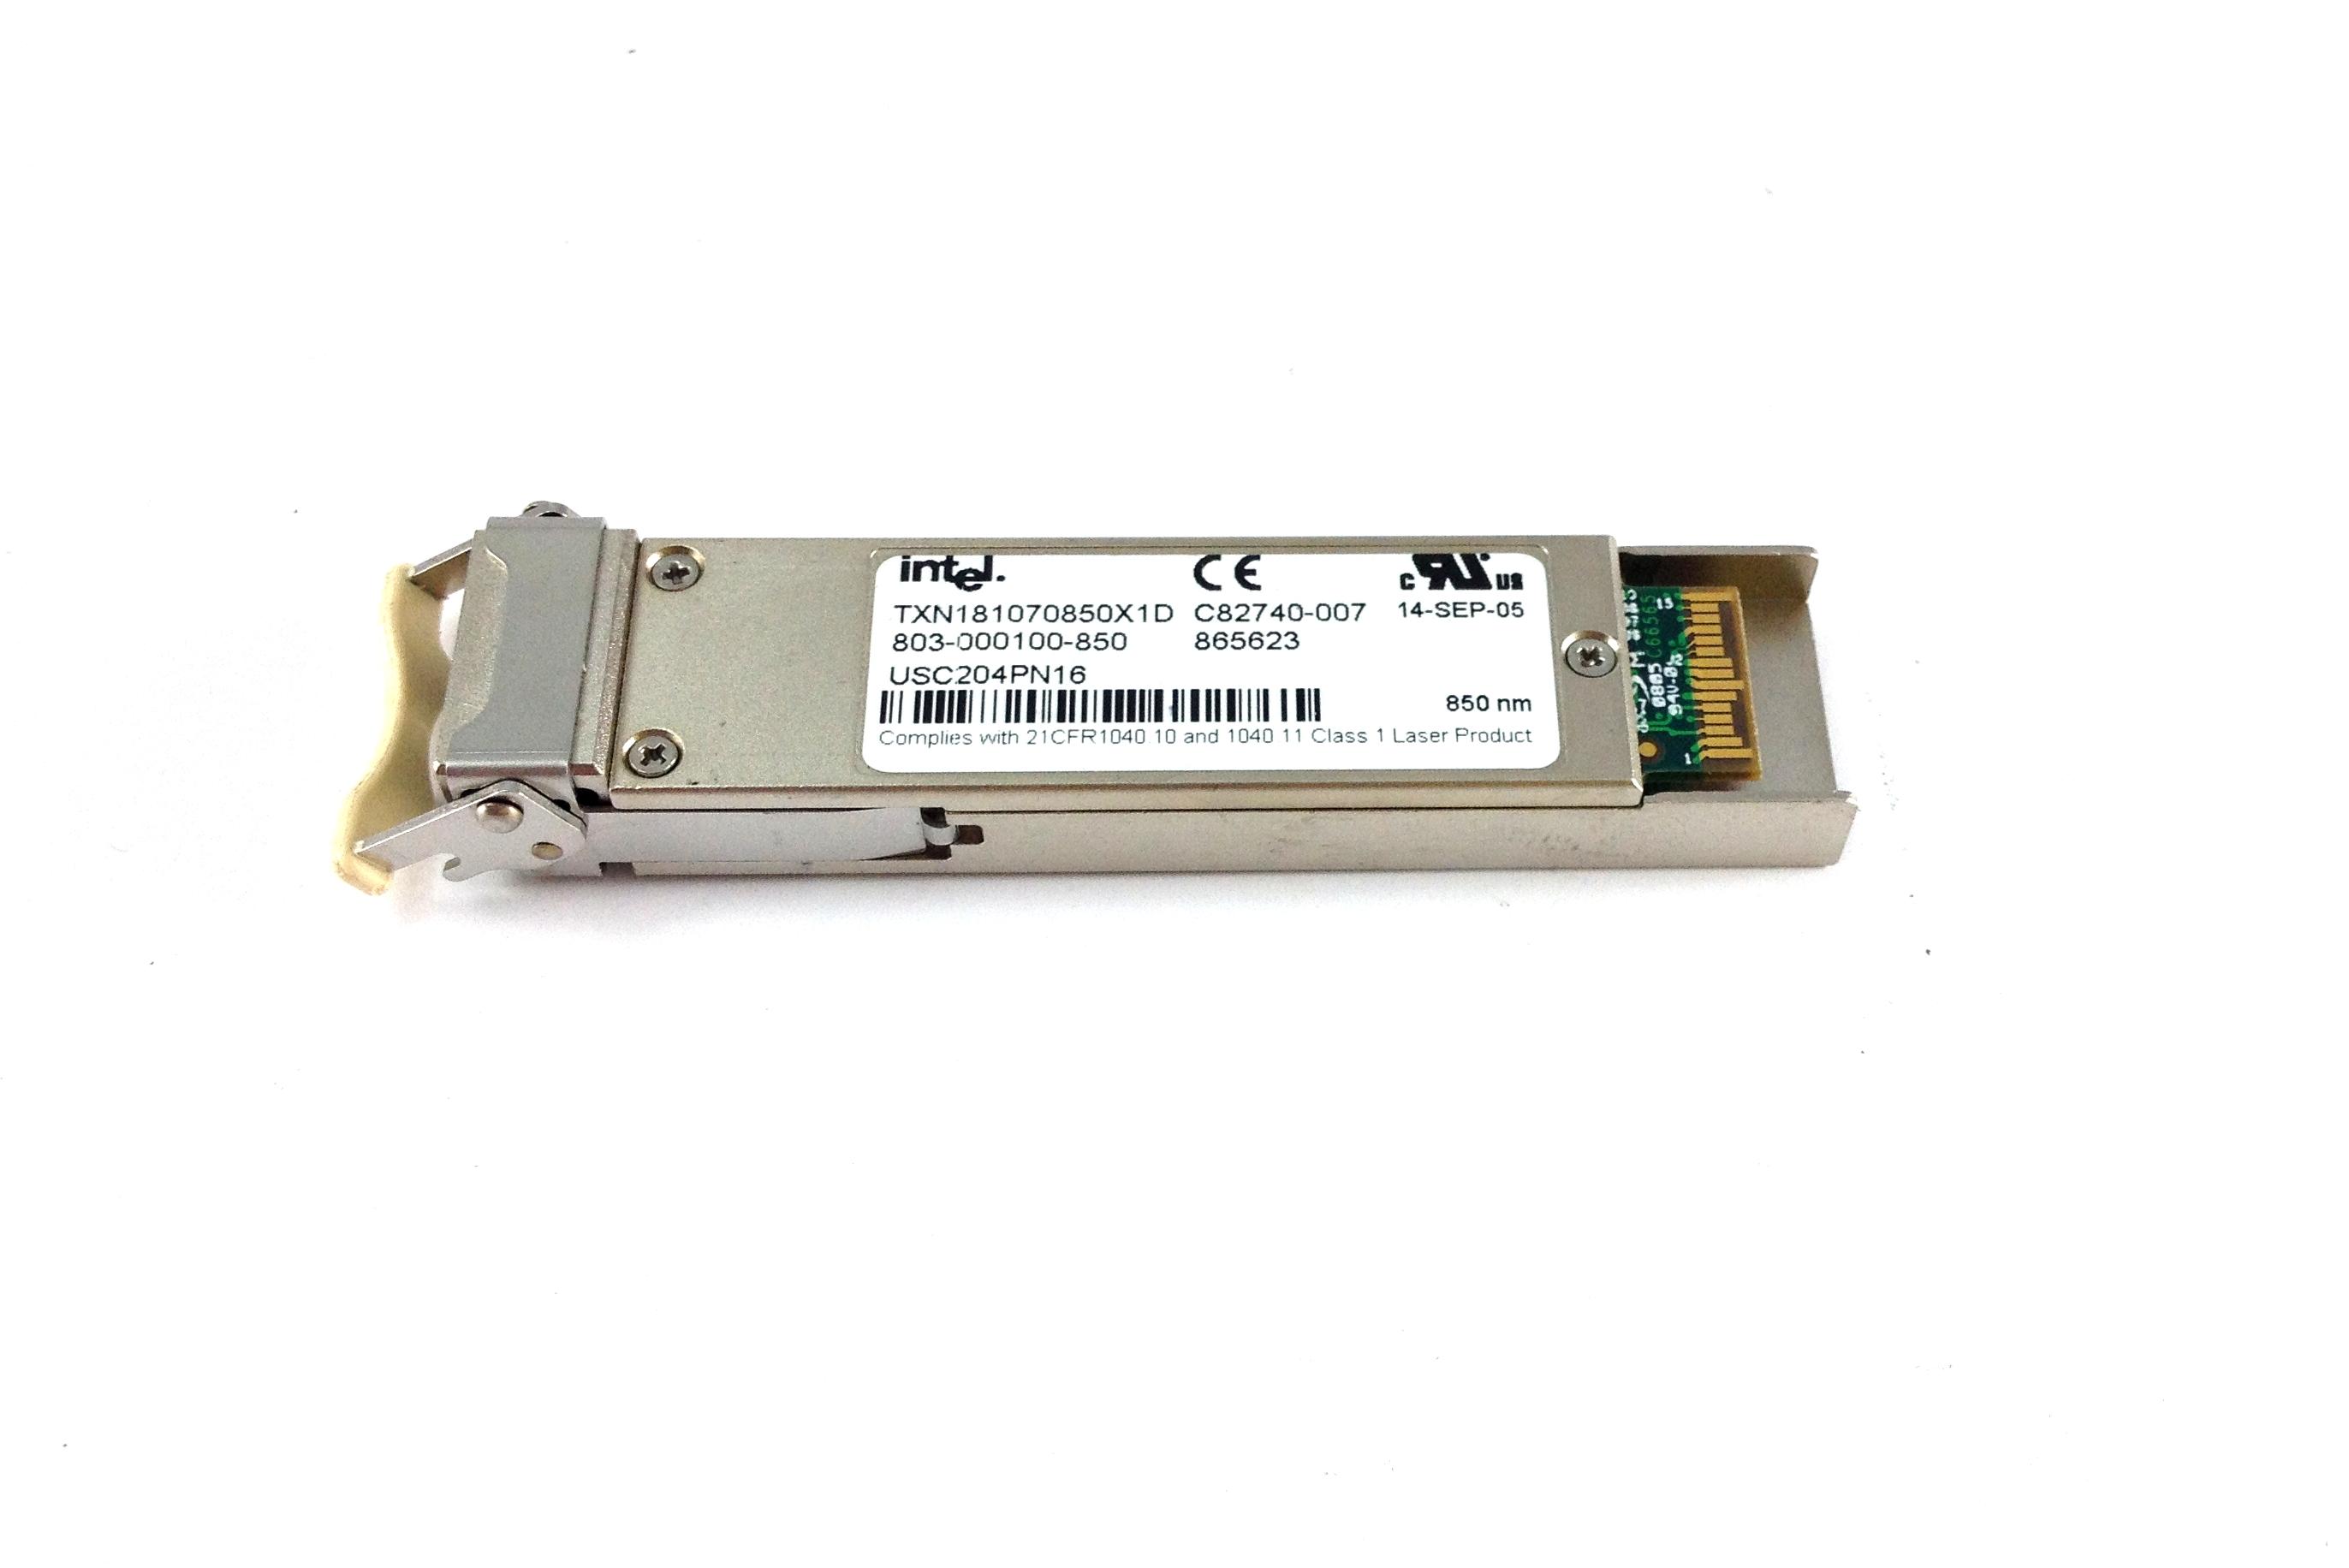 Intel 10GB Sw XFP 850NM Optical Tranceiver (TXN181070850X1D)